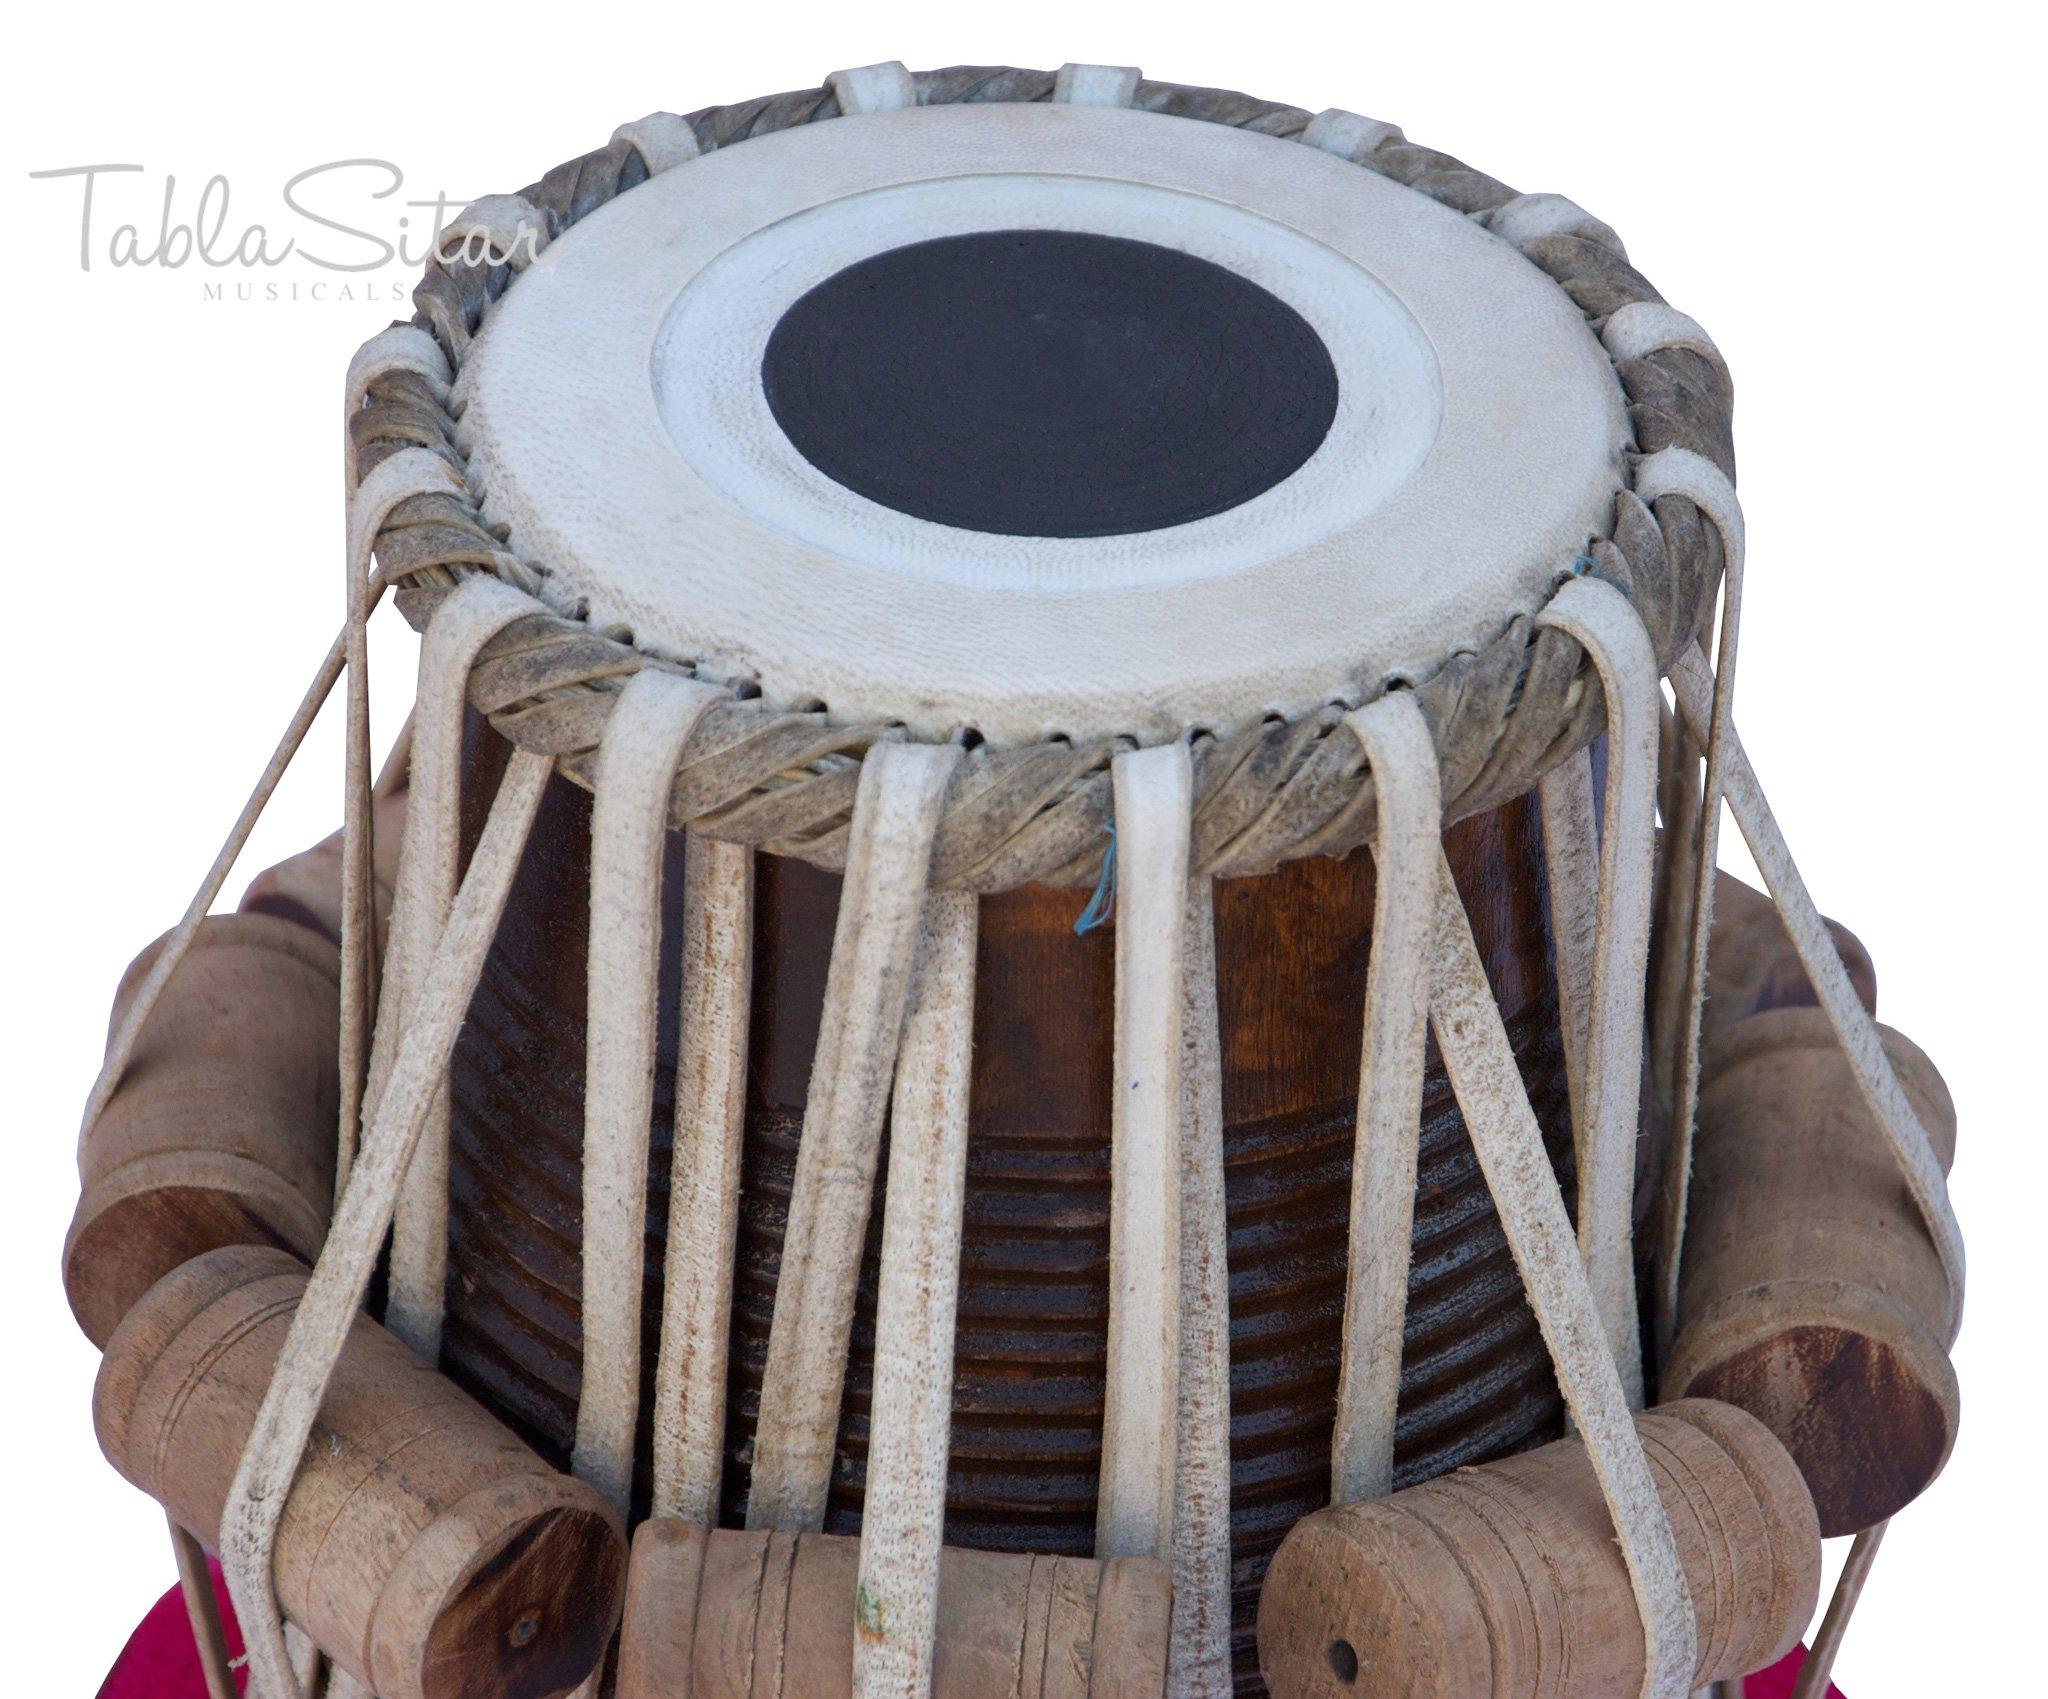 Tabla Drum Set by Maharaja Musicals, Professional, 3.5 Kg Copper Bayan - Designer Carving, Sheesham Tabla Dayan, Padded Bag, Book, Hammer, Cushions, Cover, Tabla Musical Instrument (PDI-CJH) by Maharaja Musicals (Image #6)